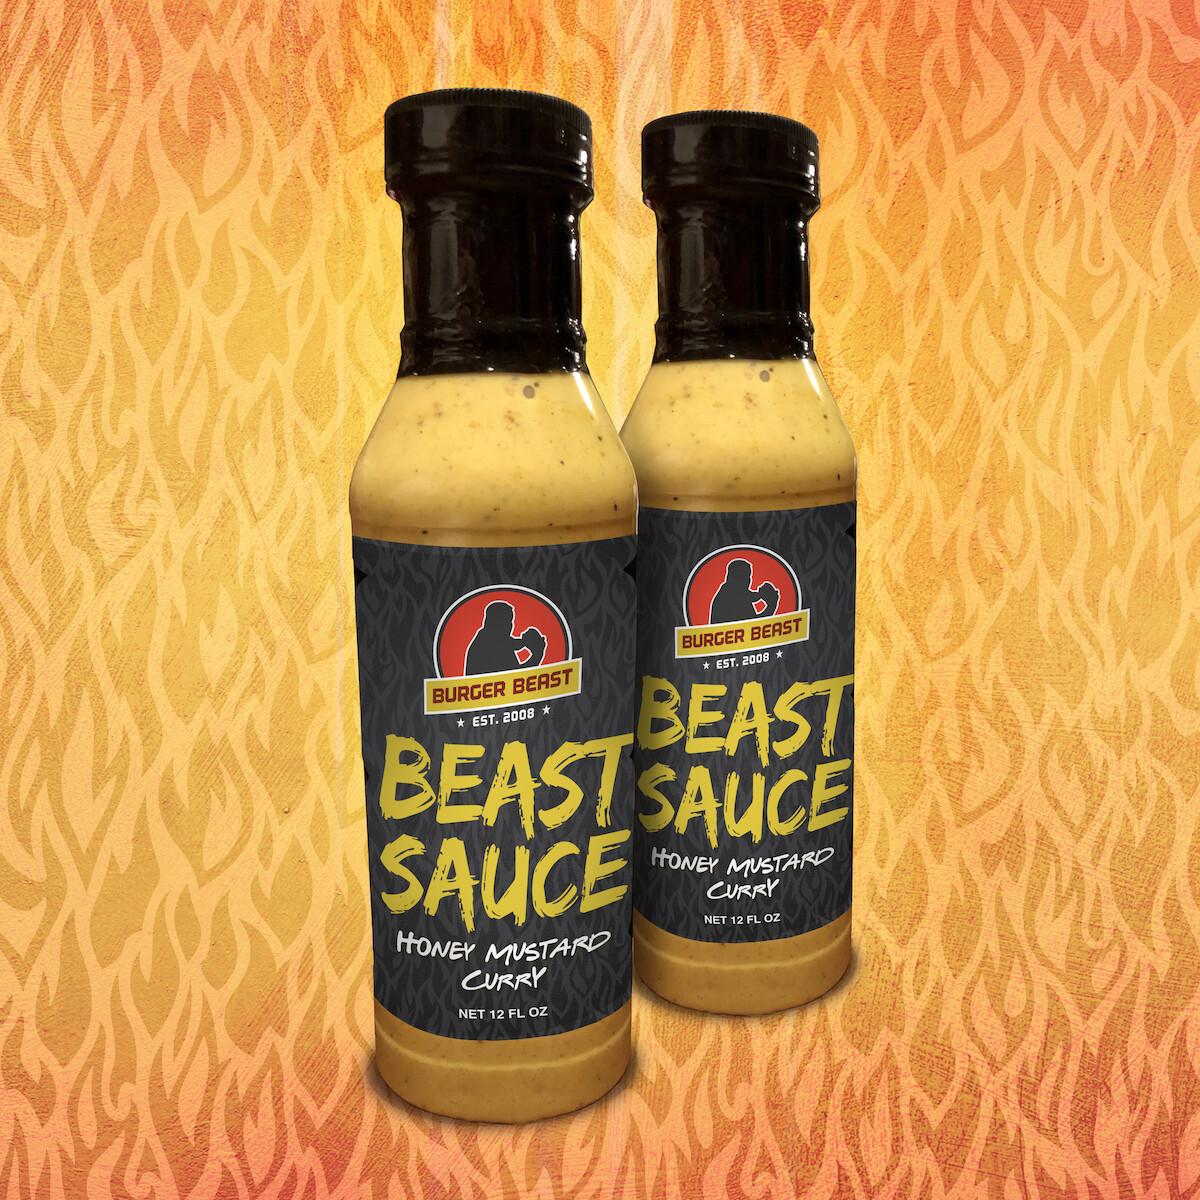 PREORDER - 2 Bottles of Honey Mustard Curry